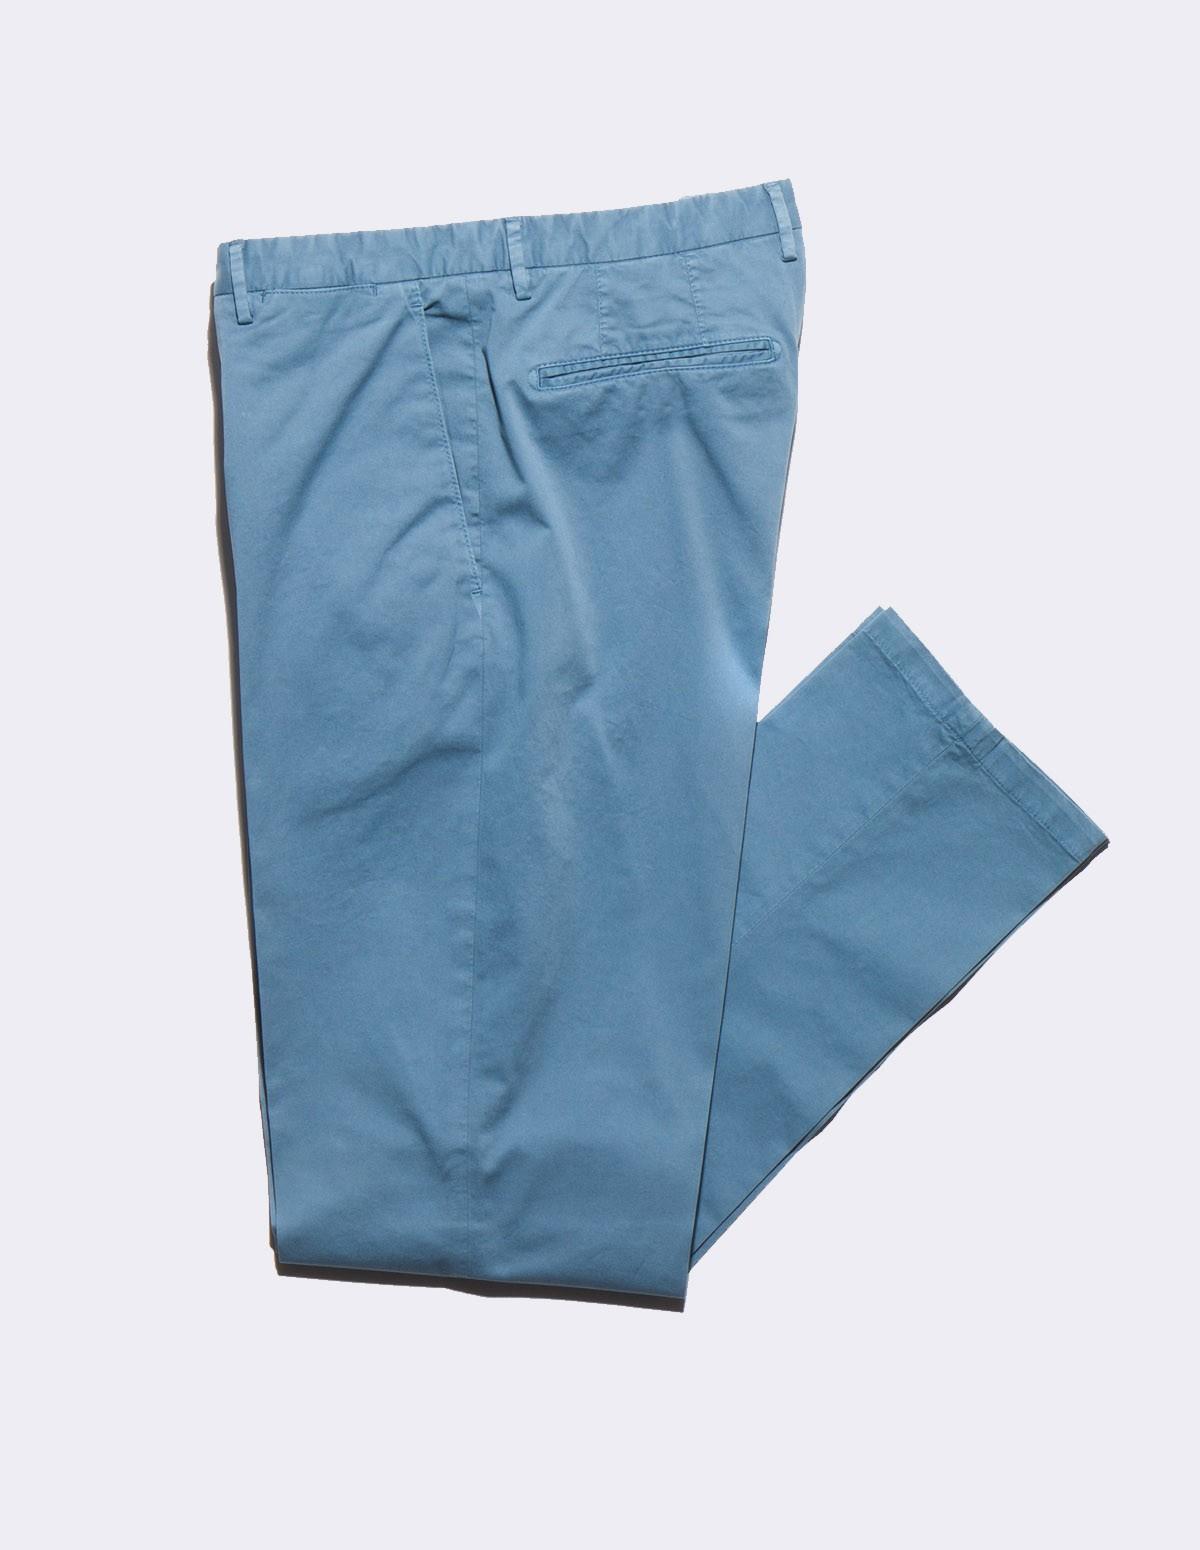 Boglioli Cotton Twill Pants - 0670 BLEU